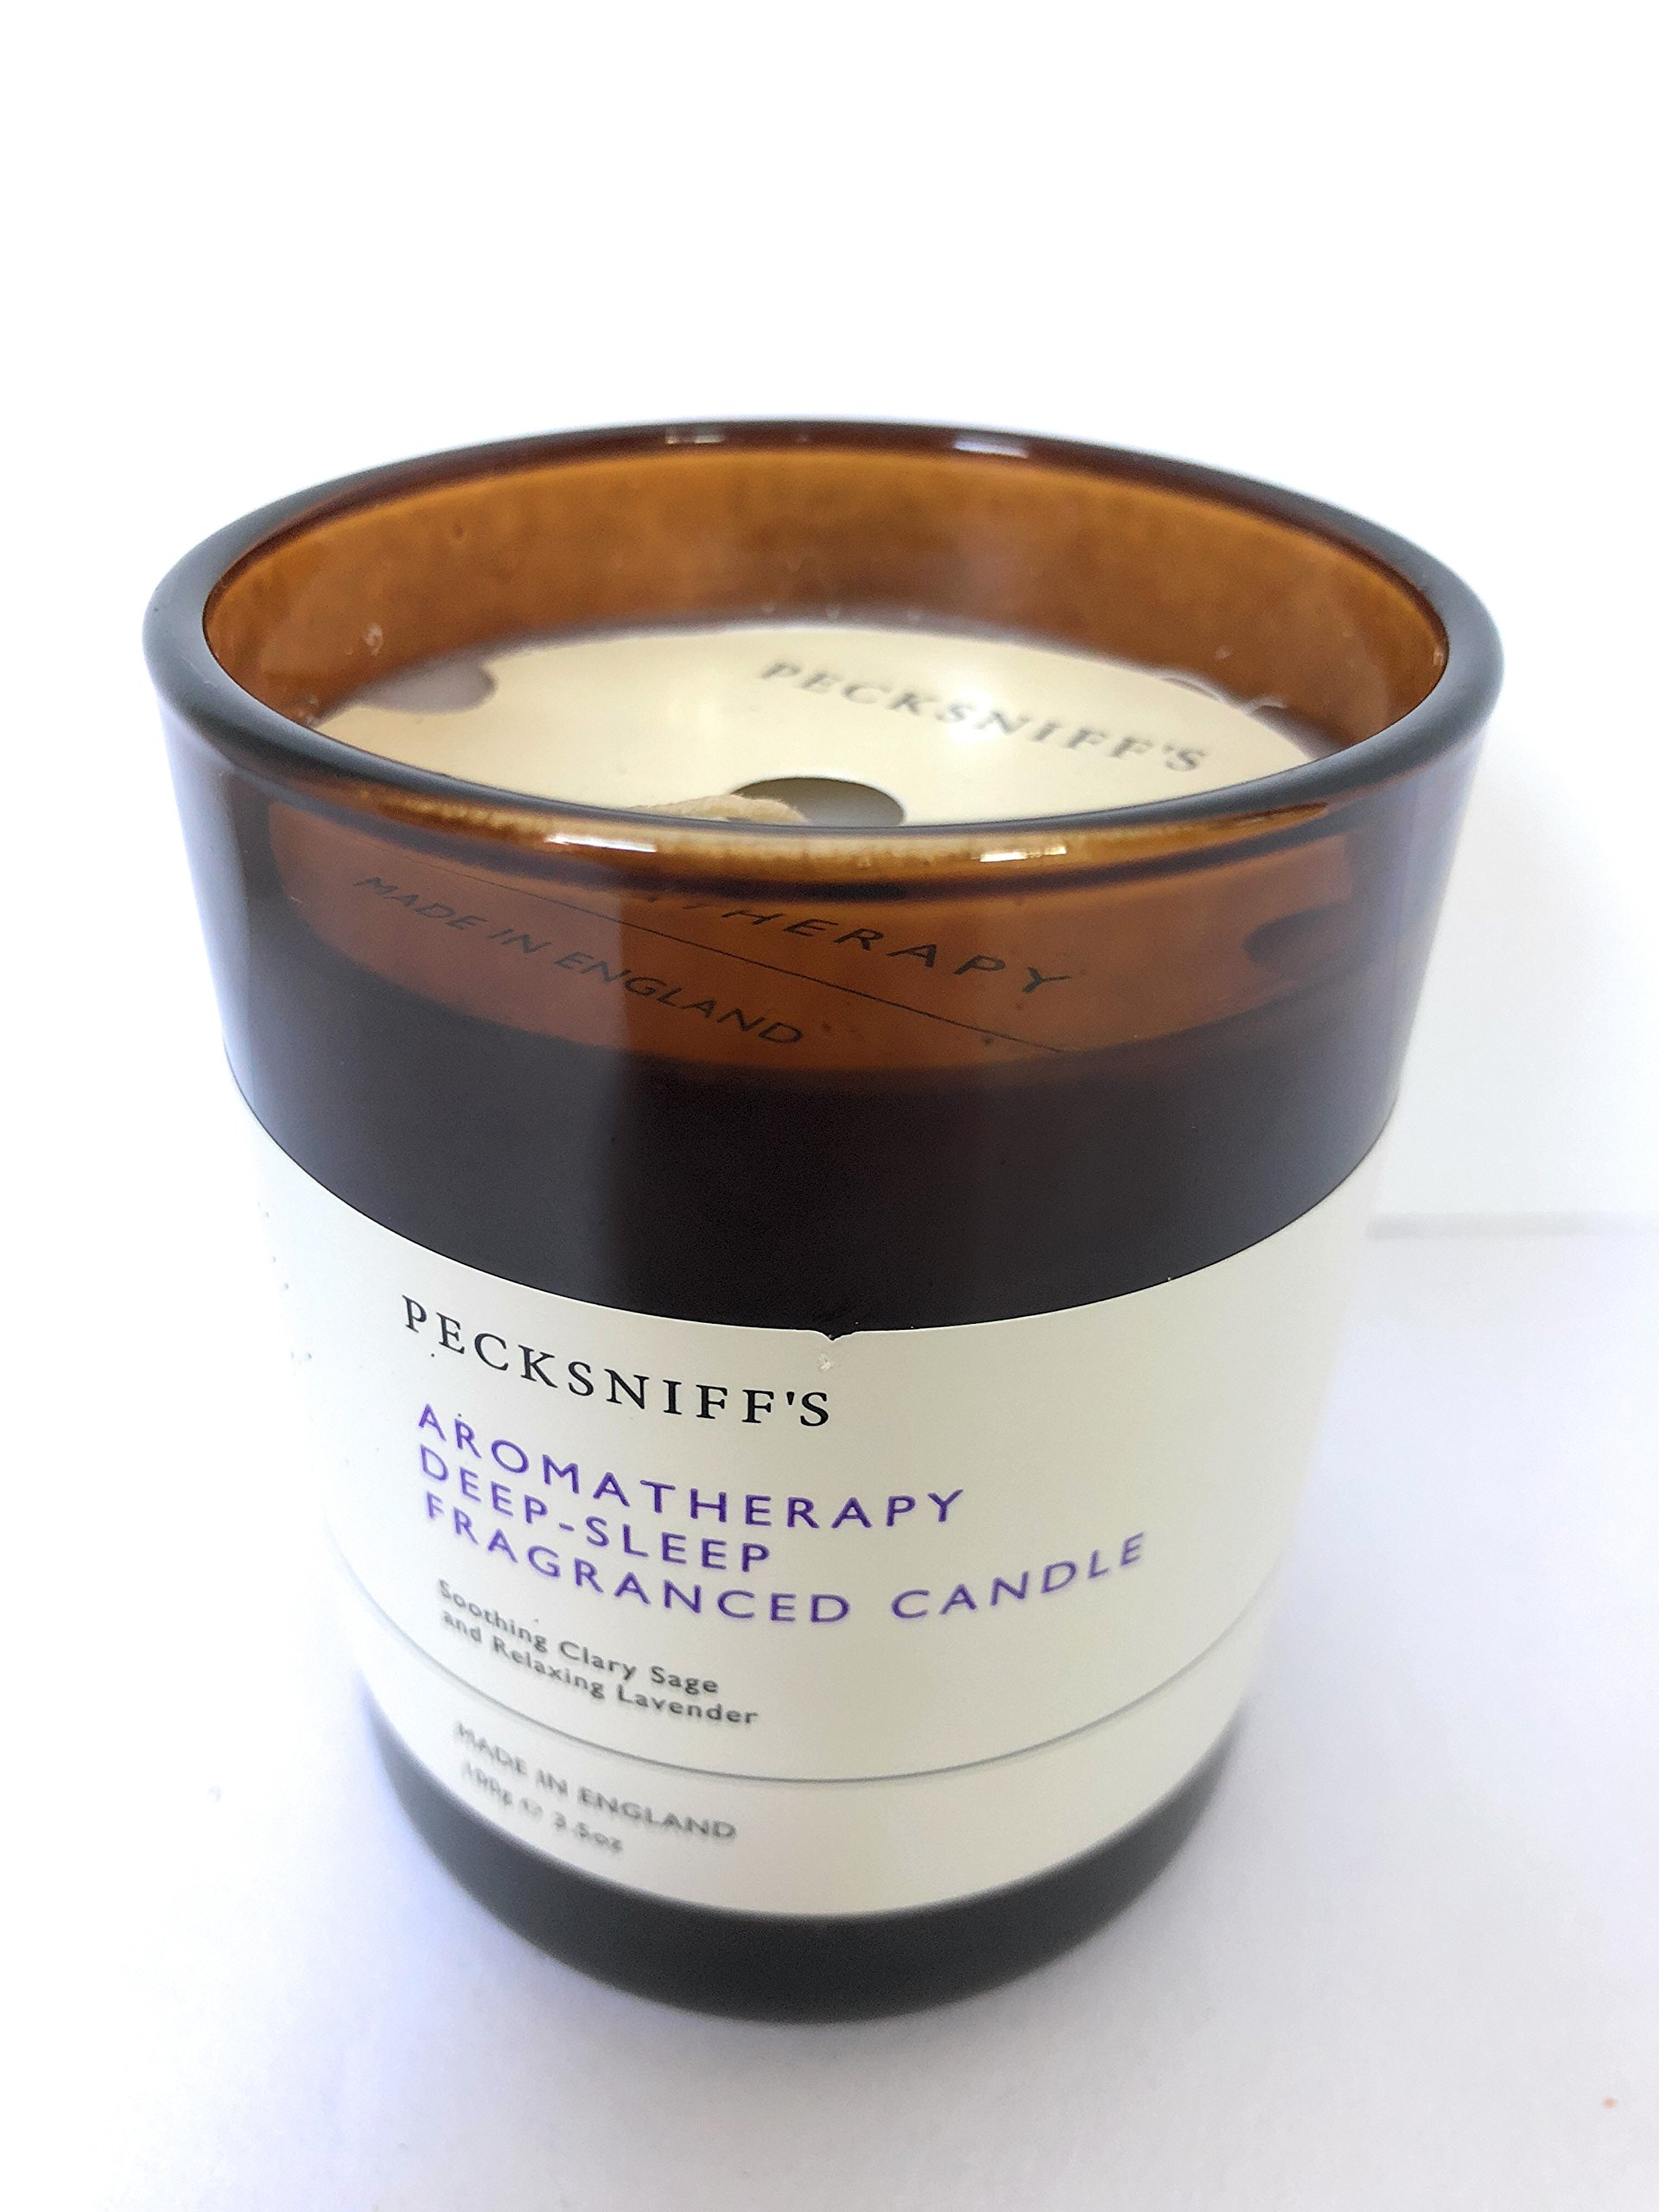 Pecksniffs - Aromatherapy Deep Sleep Candle, ClarySage & Lavender